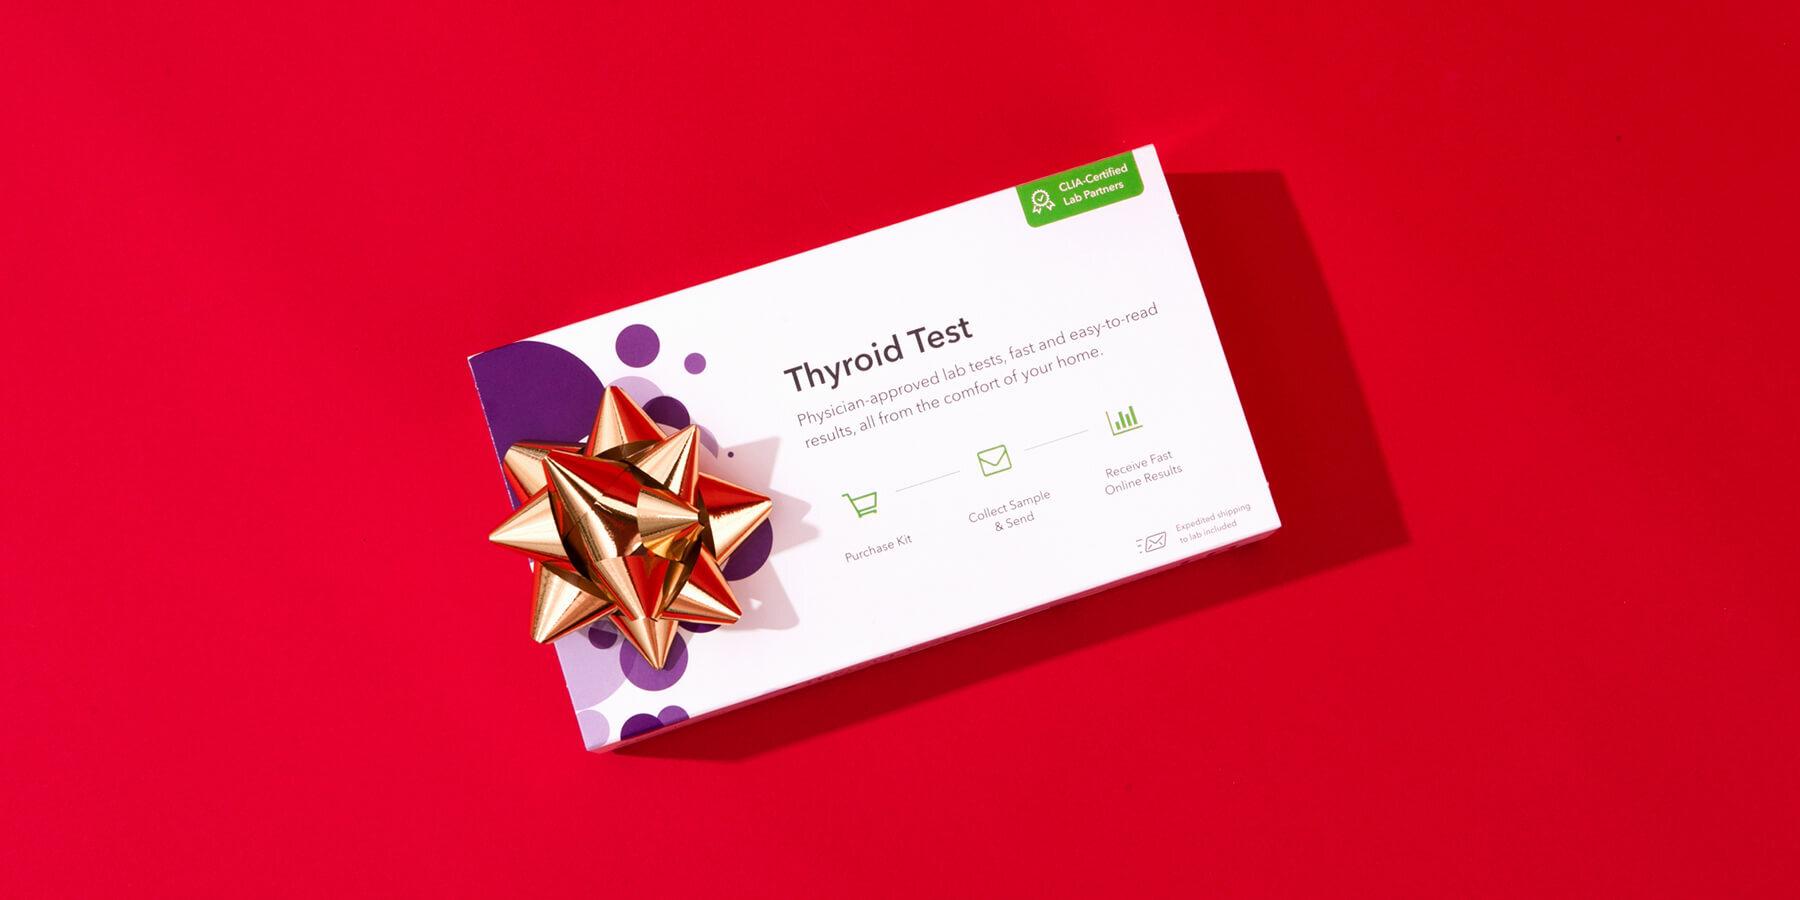 Holiday thyroid